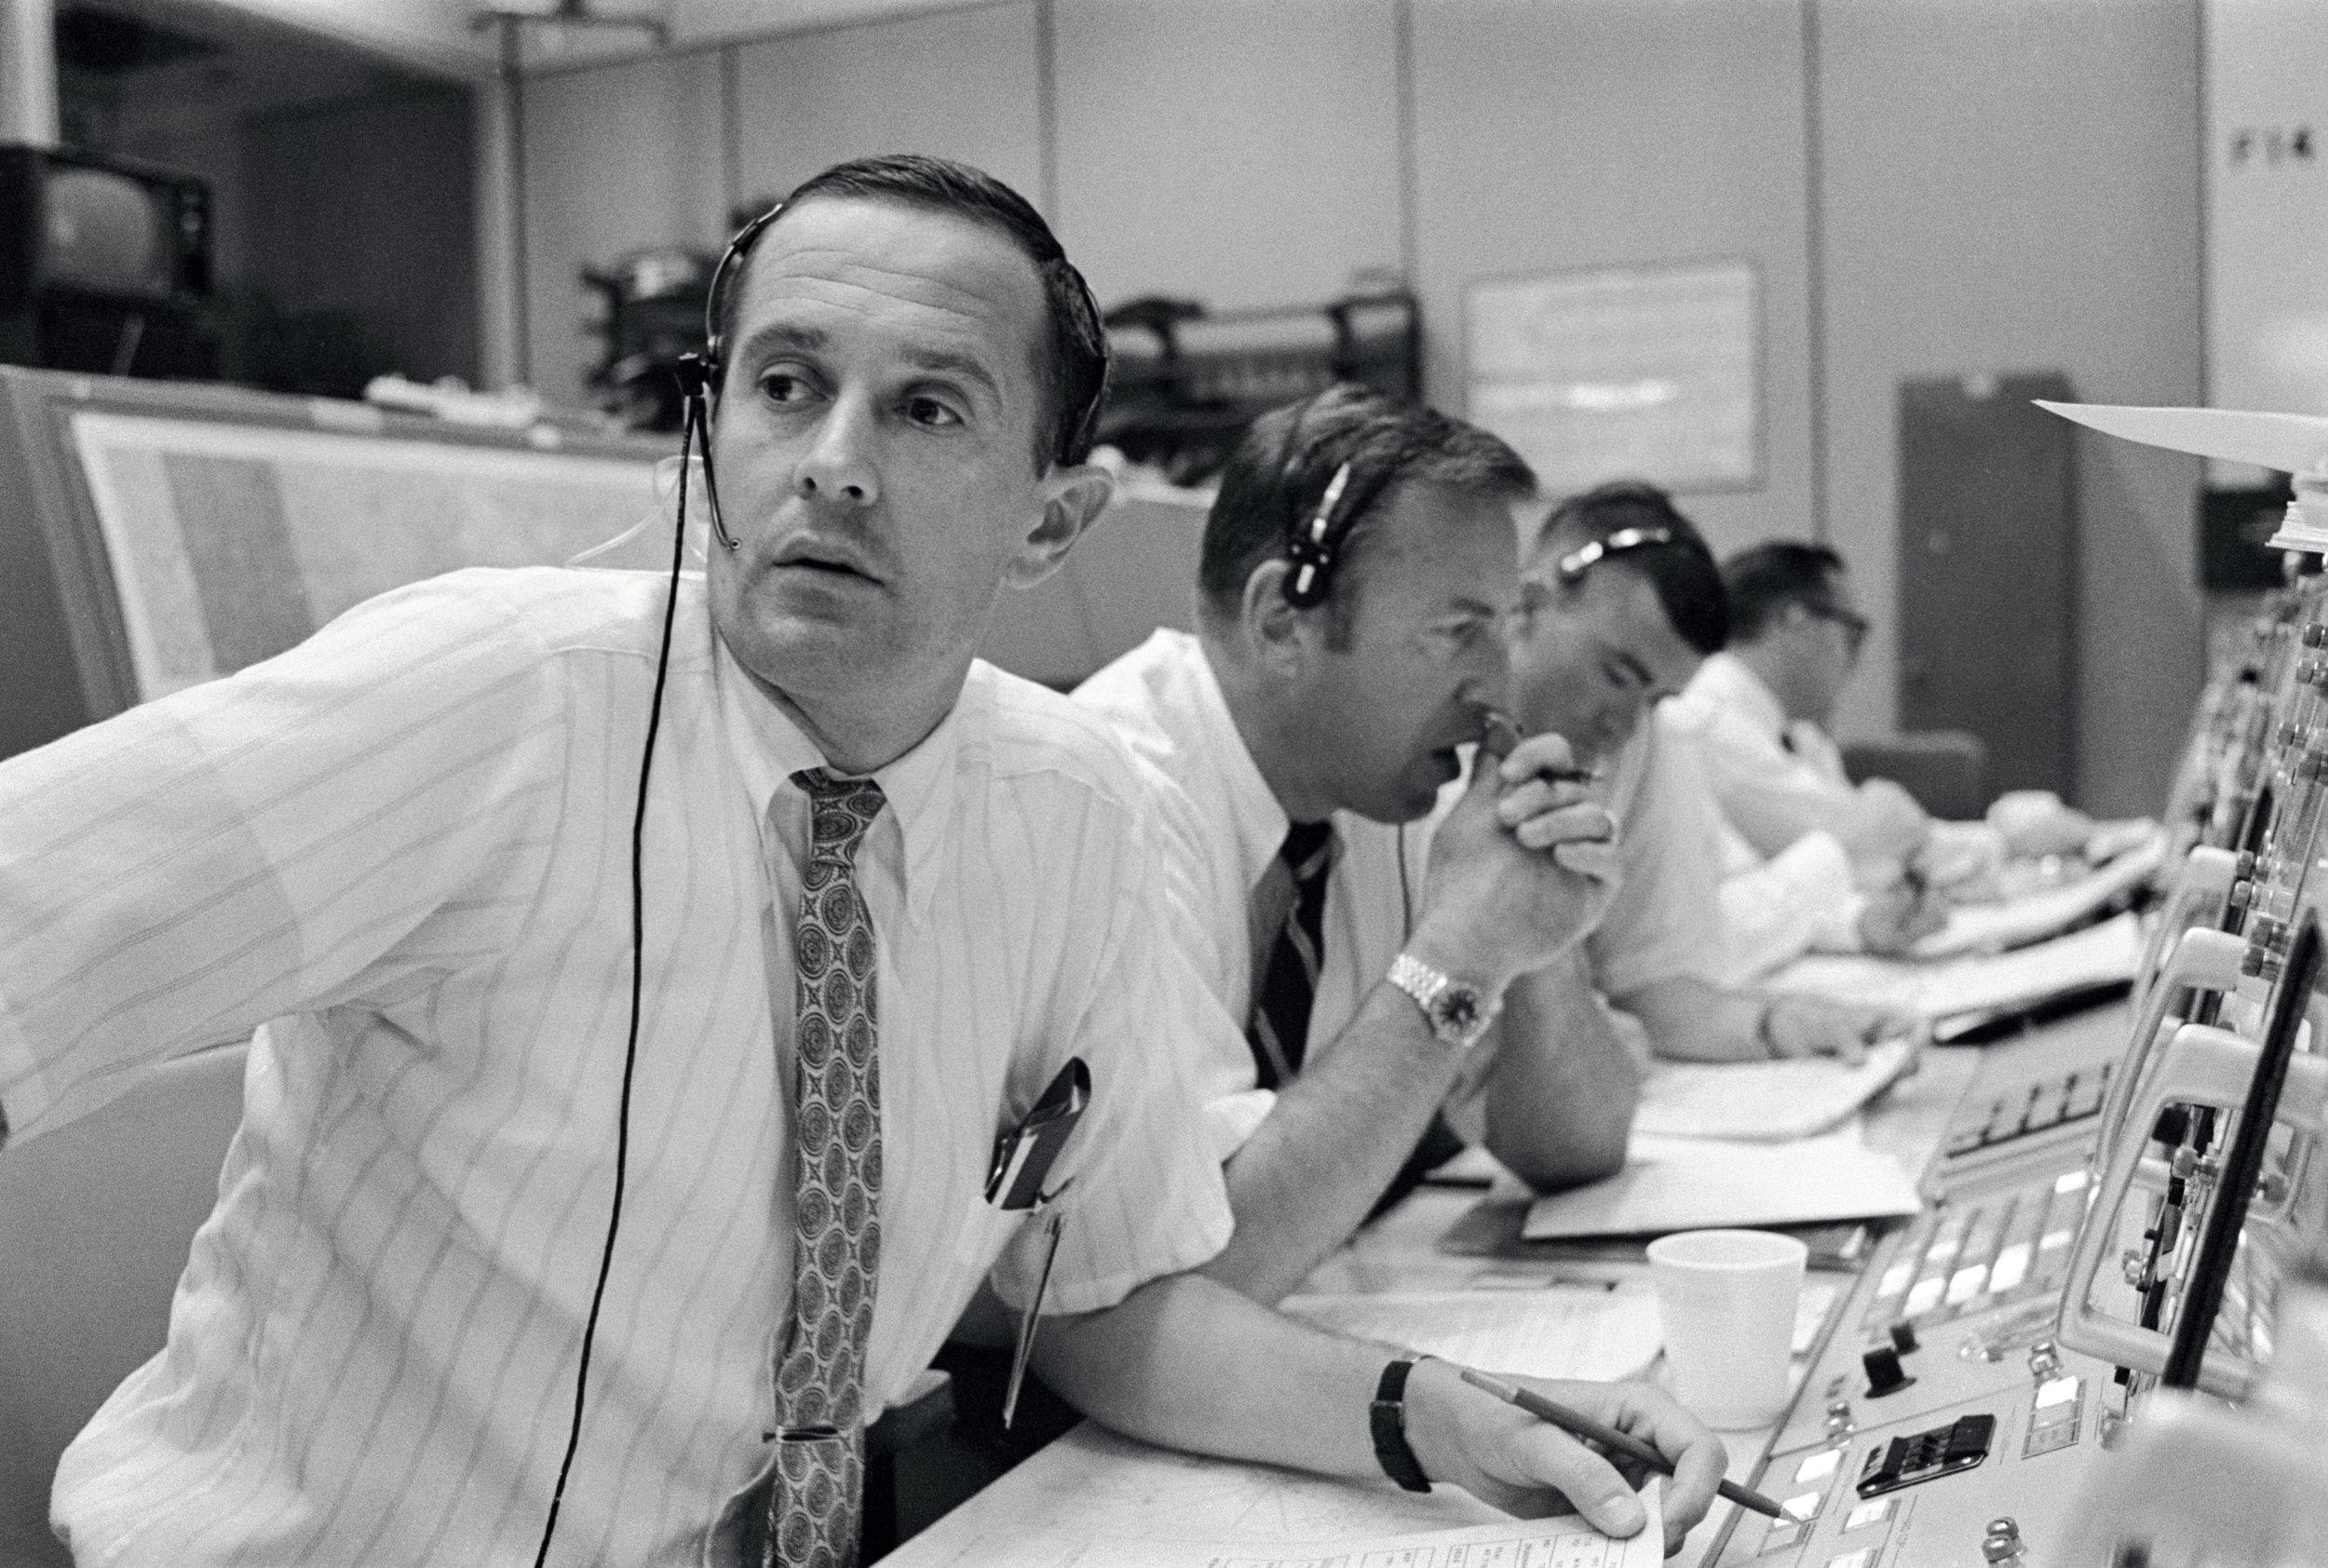 Duke, Lovell, and Haise at the Apollo 11 Capcom, Johnson Space Center, Houston, Texas